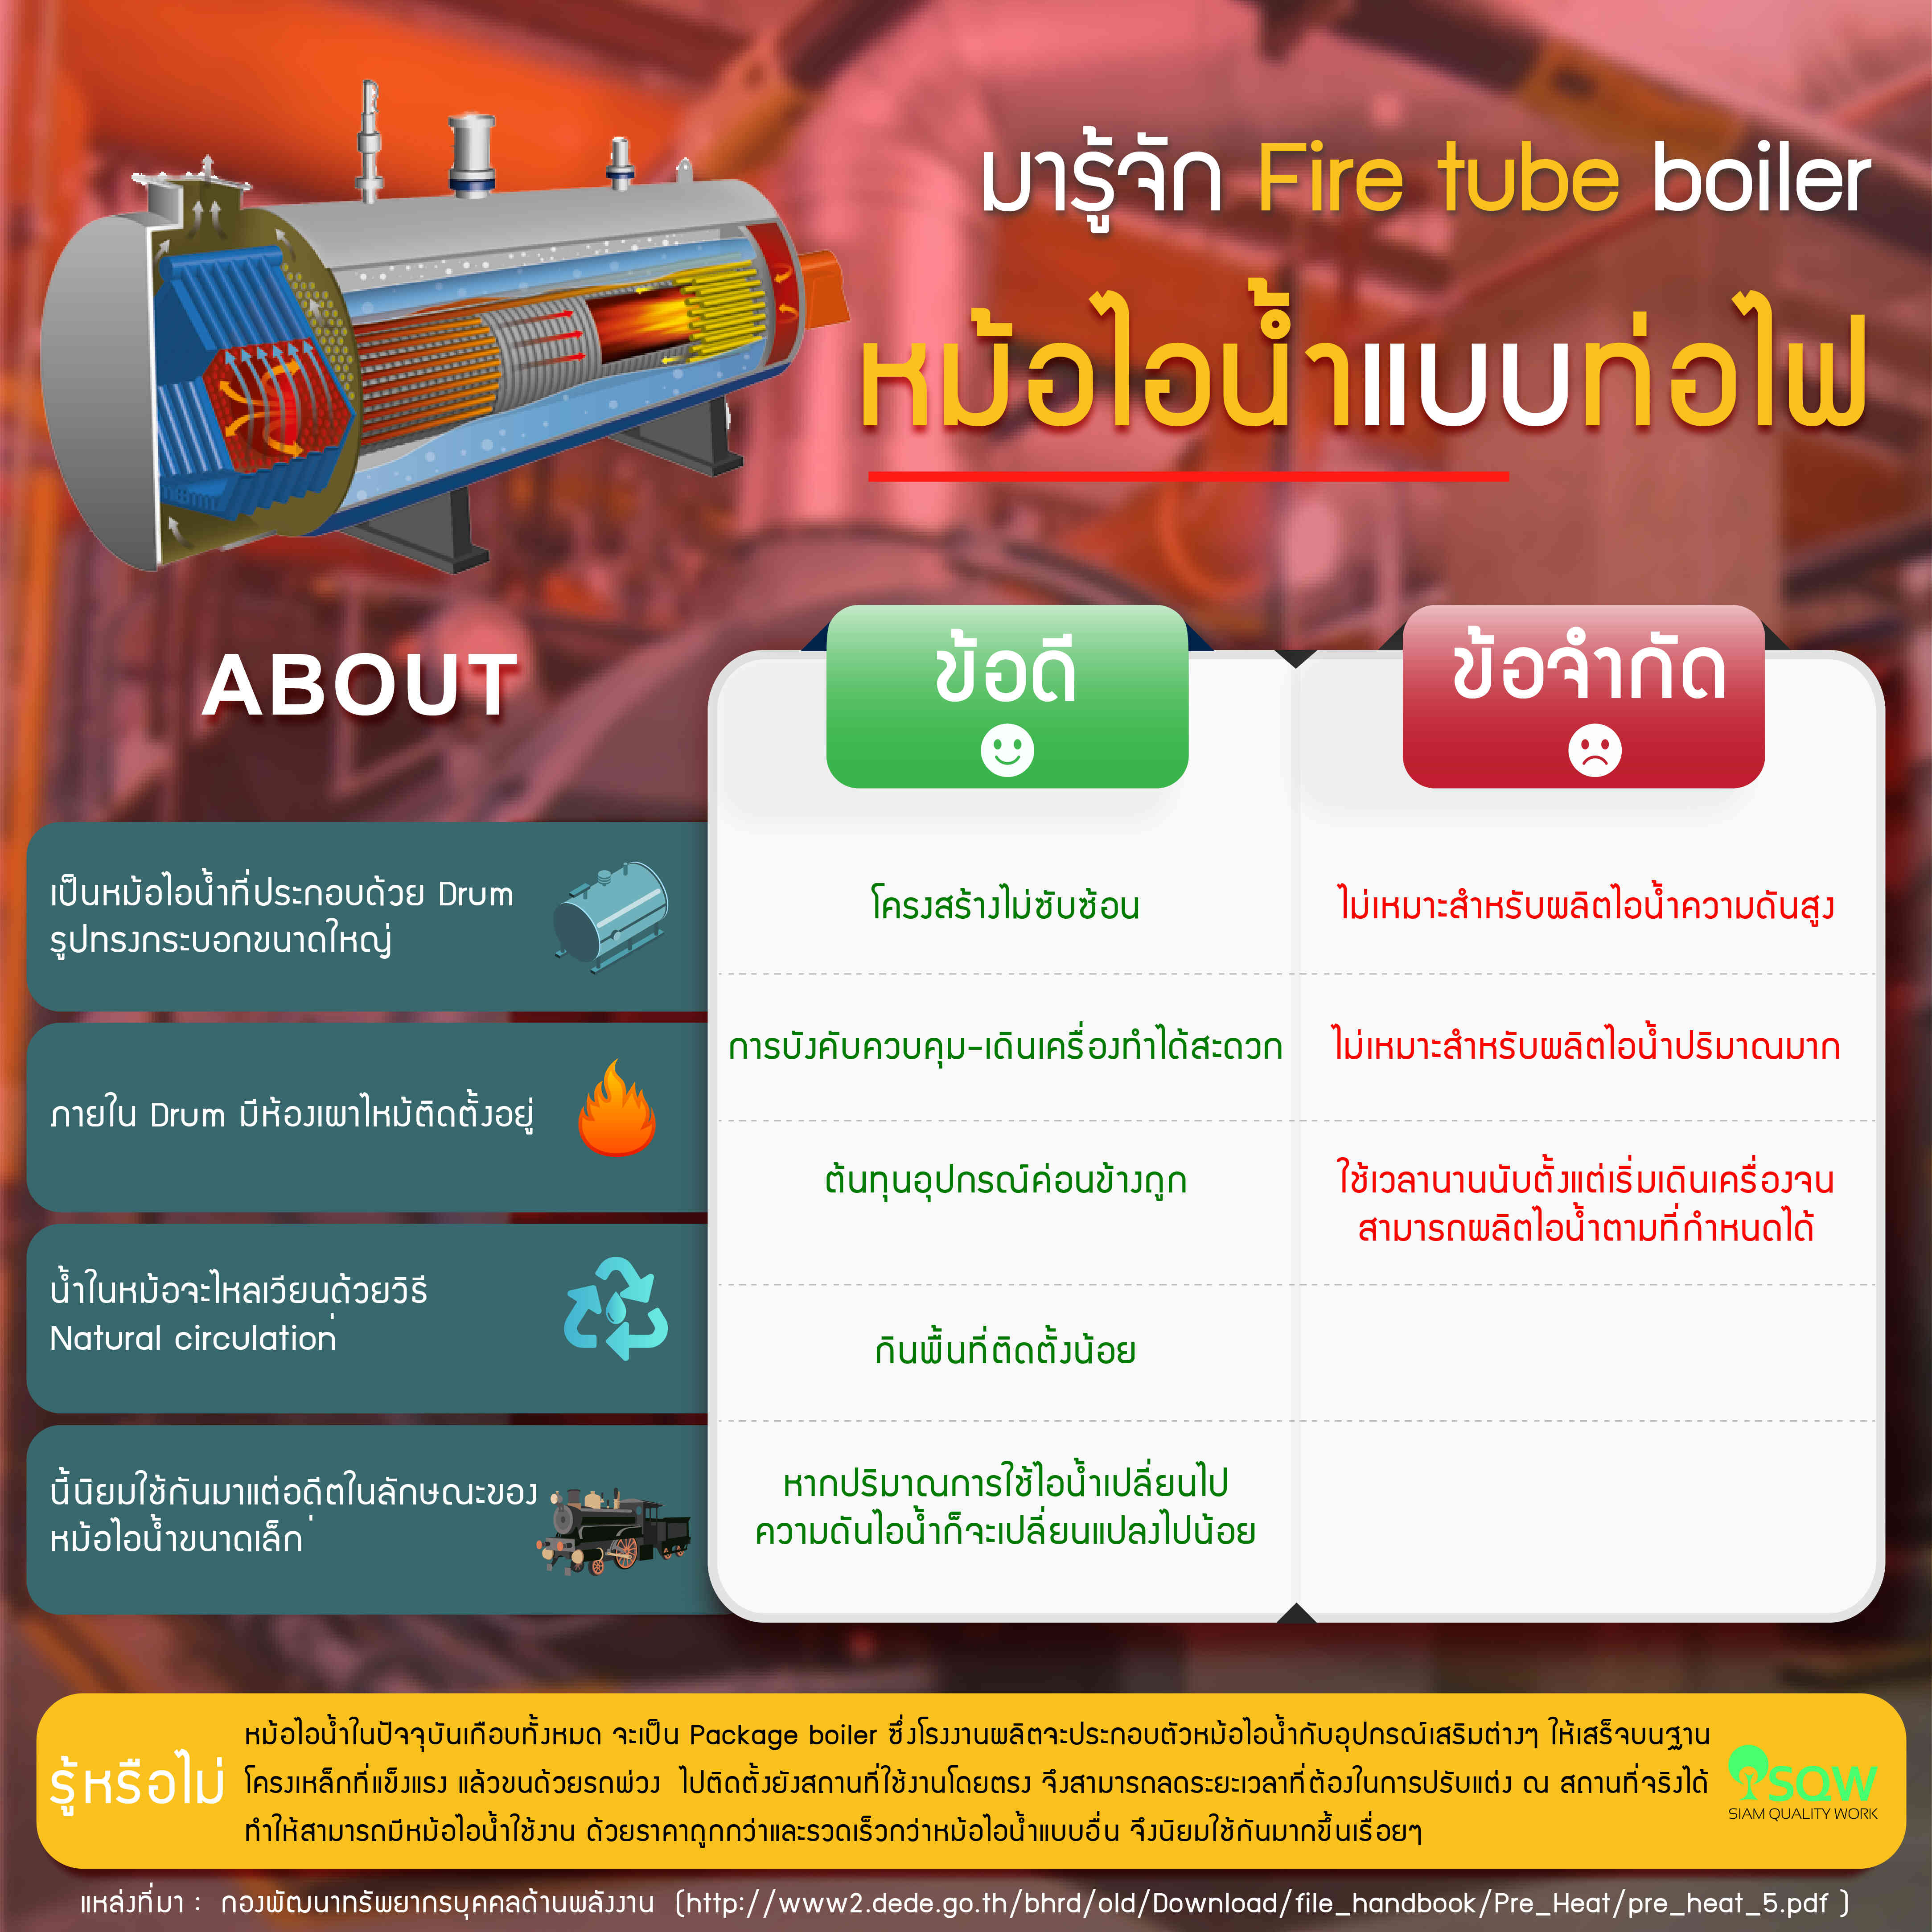 Fire tube Boiler หม้อไอน้ำแบบท่อไฟ